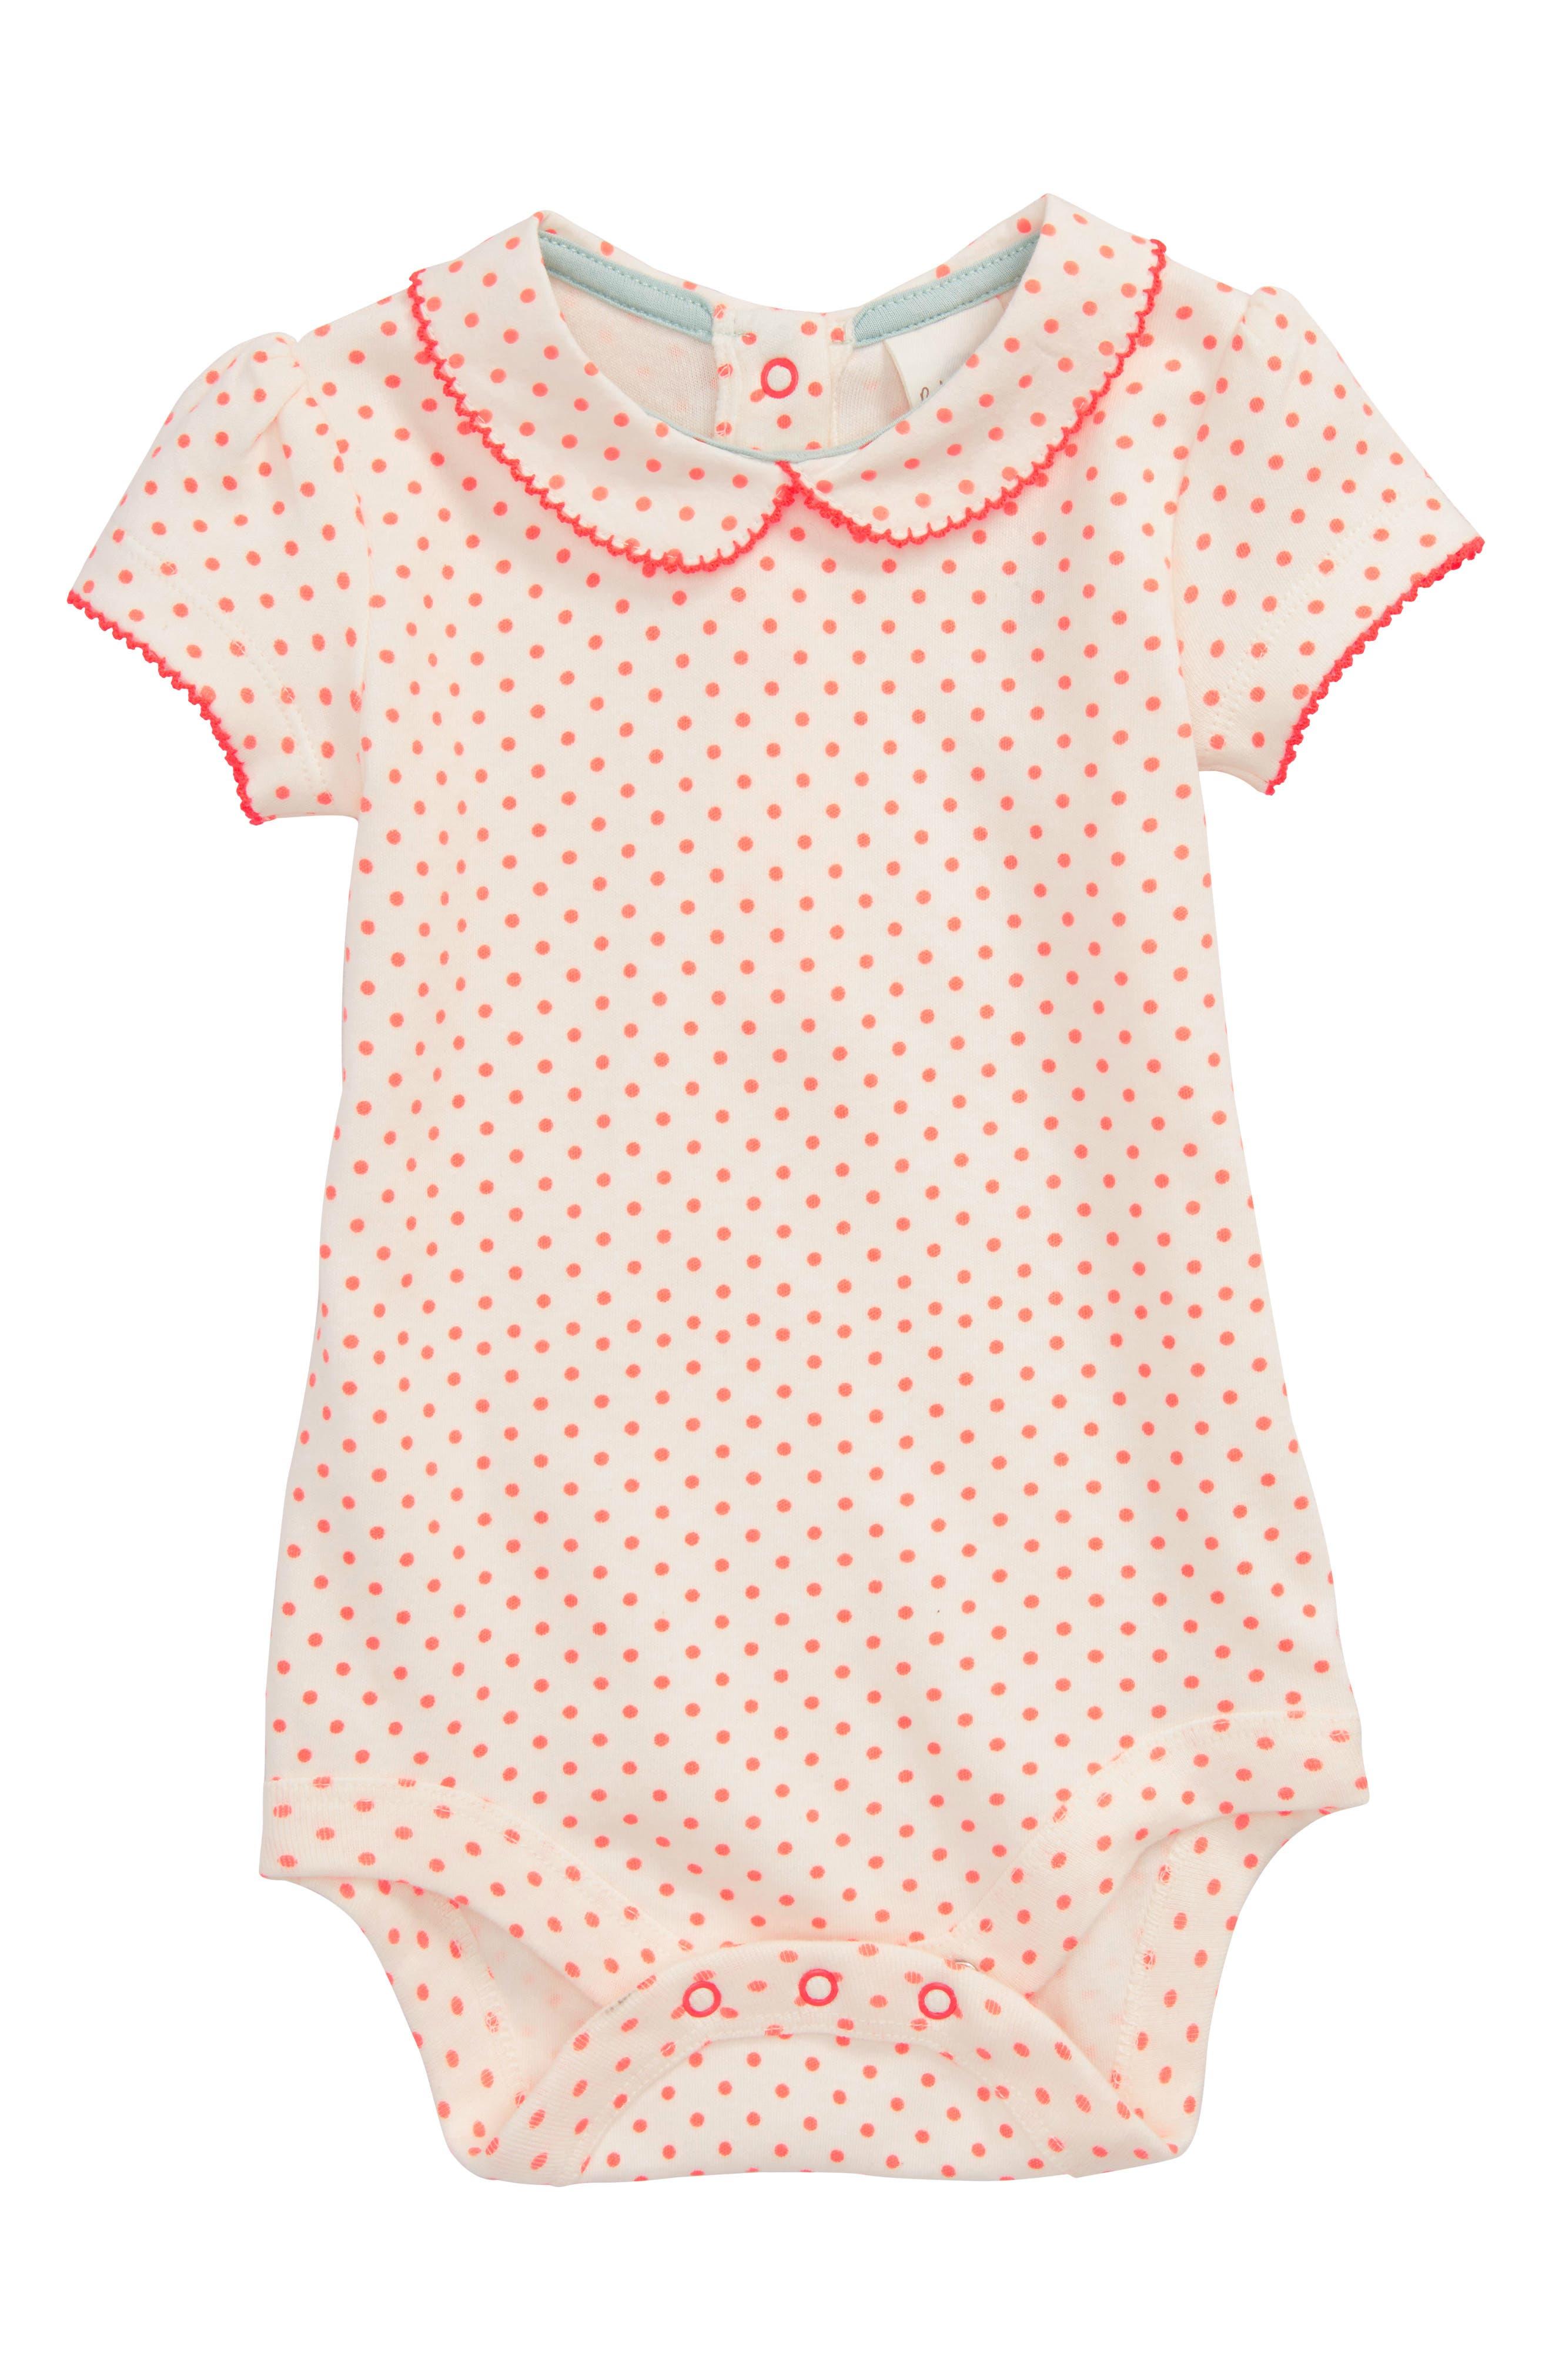 Main Image - Mini Boden Summer Collar Bodysuit (Baby Girls)